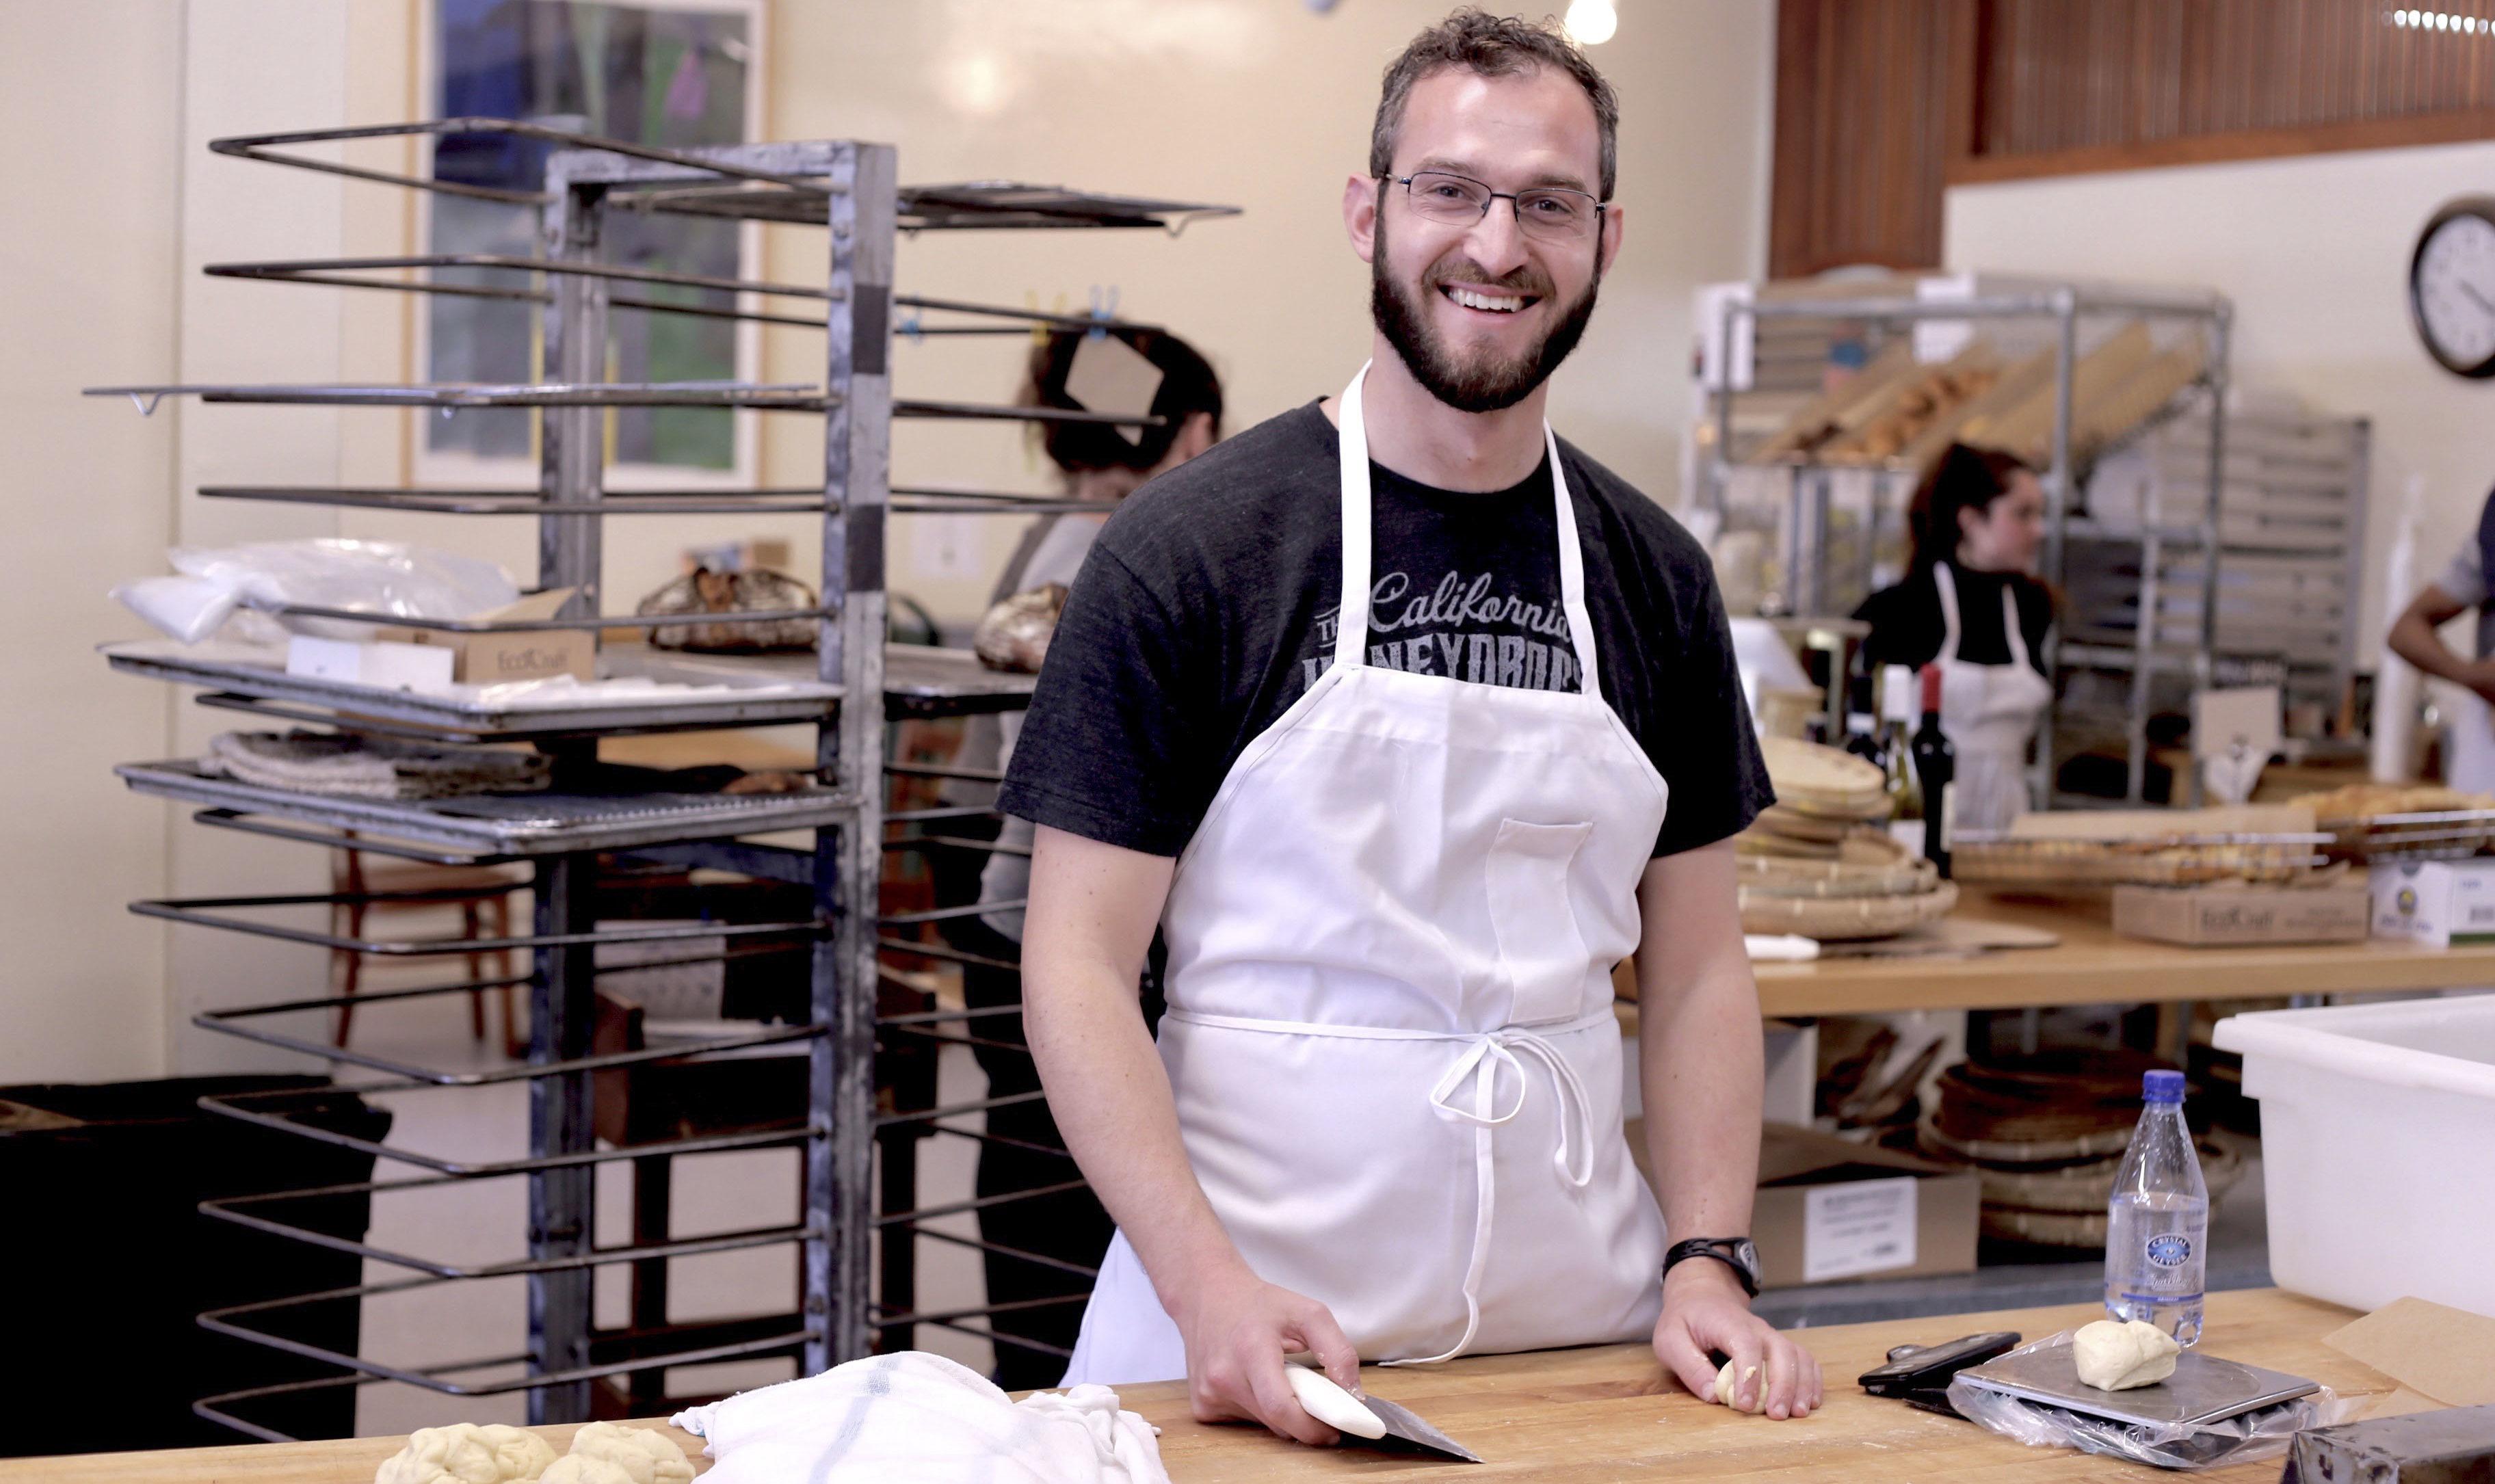 Sam Tobis is the new owner of Grand Bakery (Photo/Courtesy Sam Tobis)